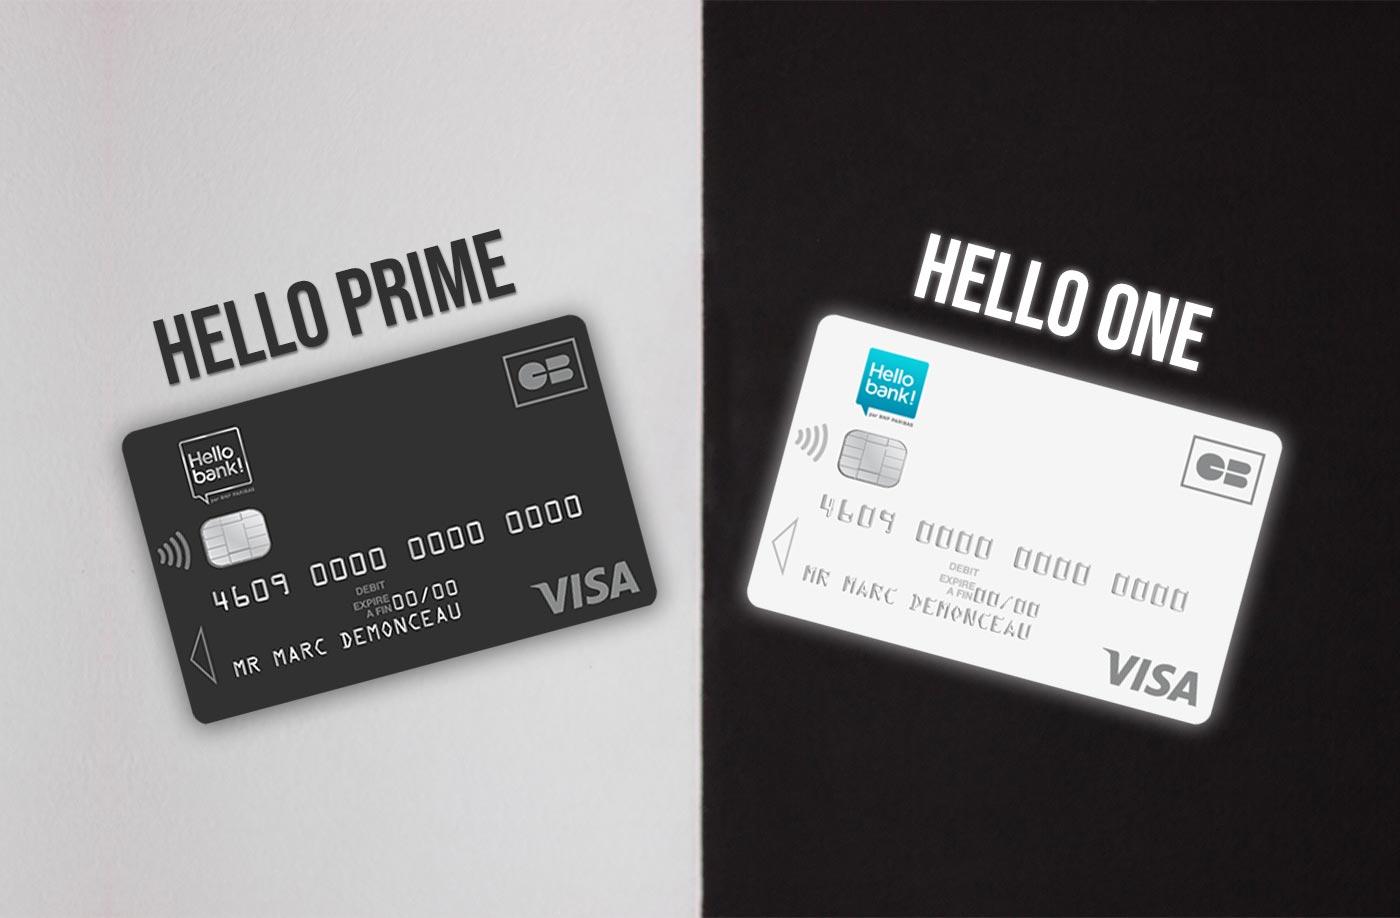 Hello one vs hello prime - Hello bank!